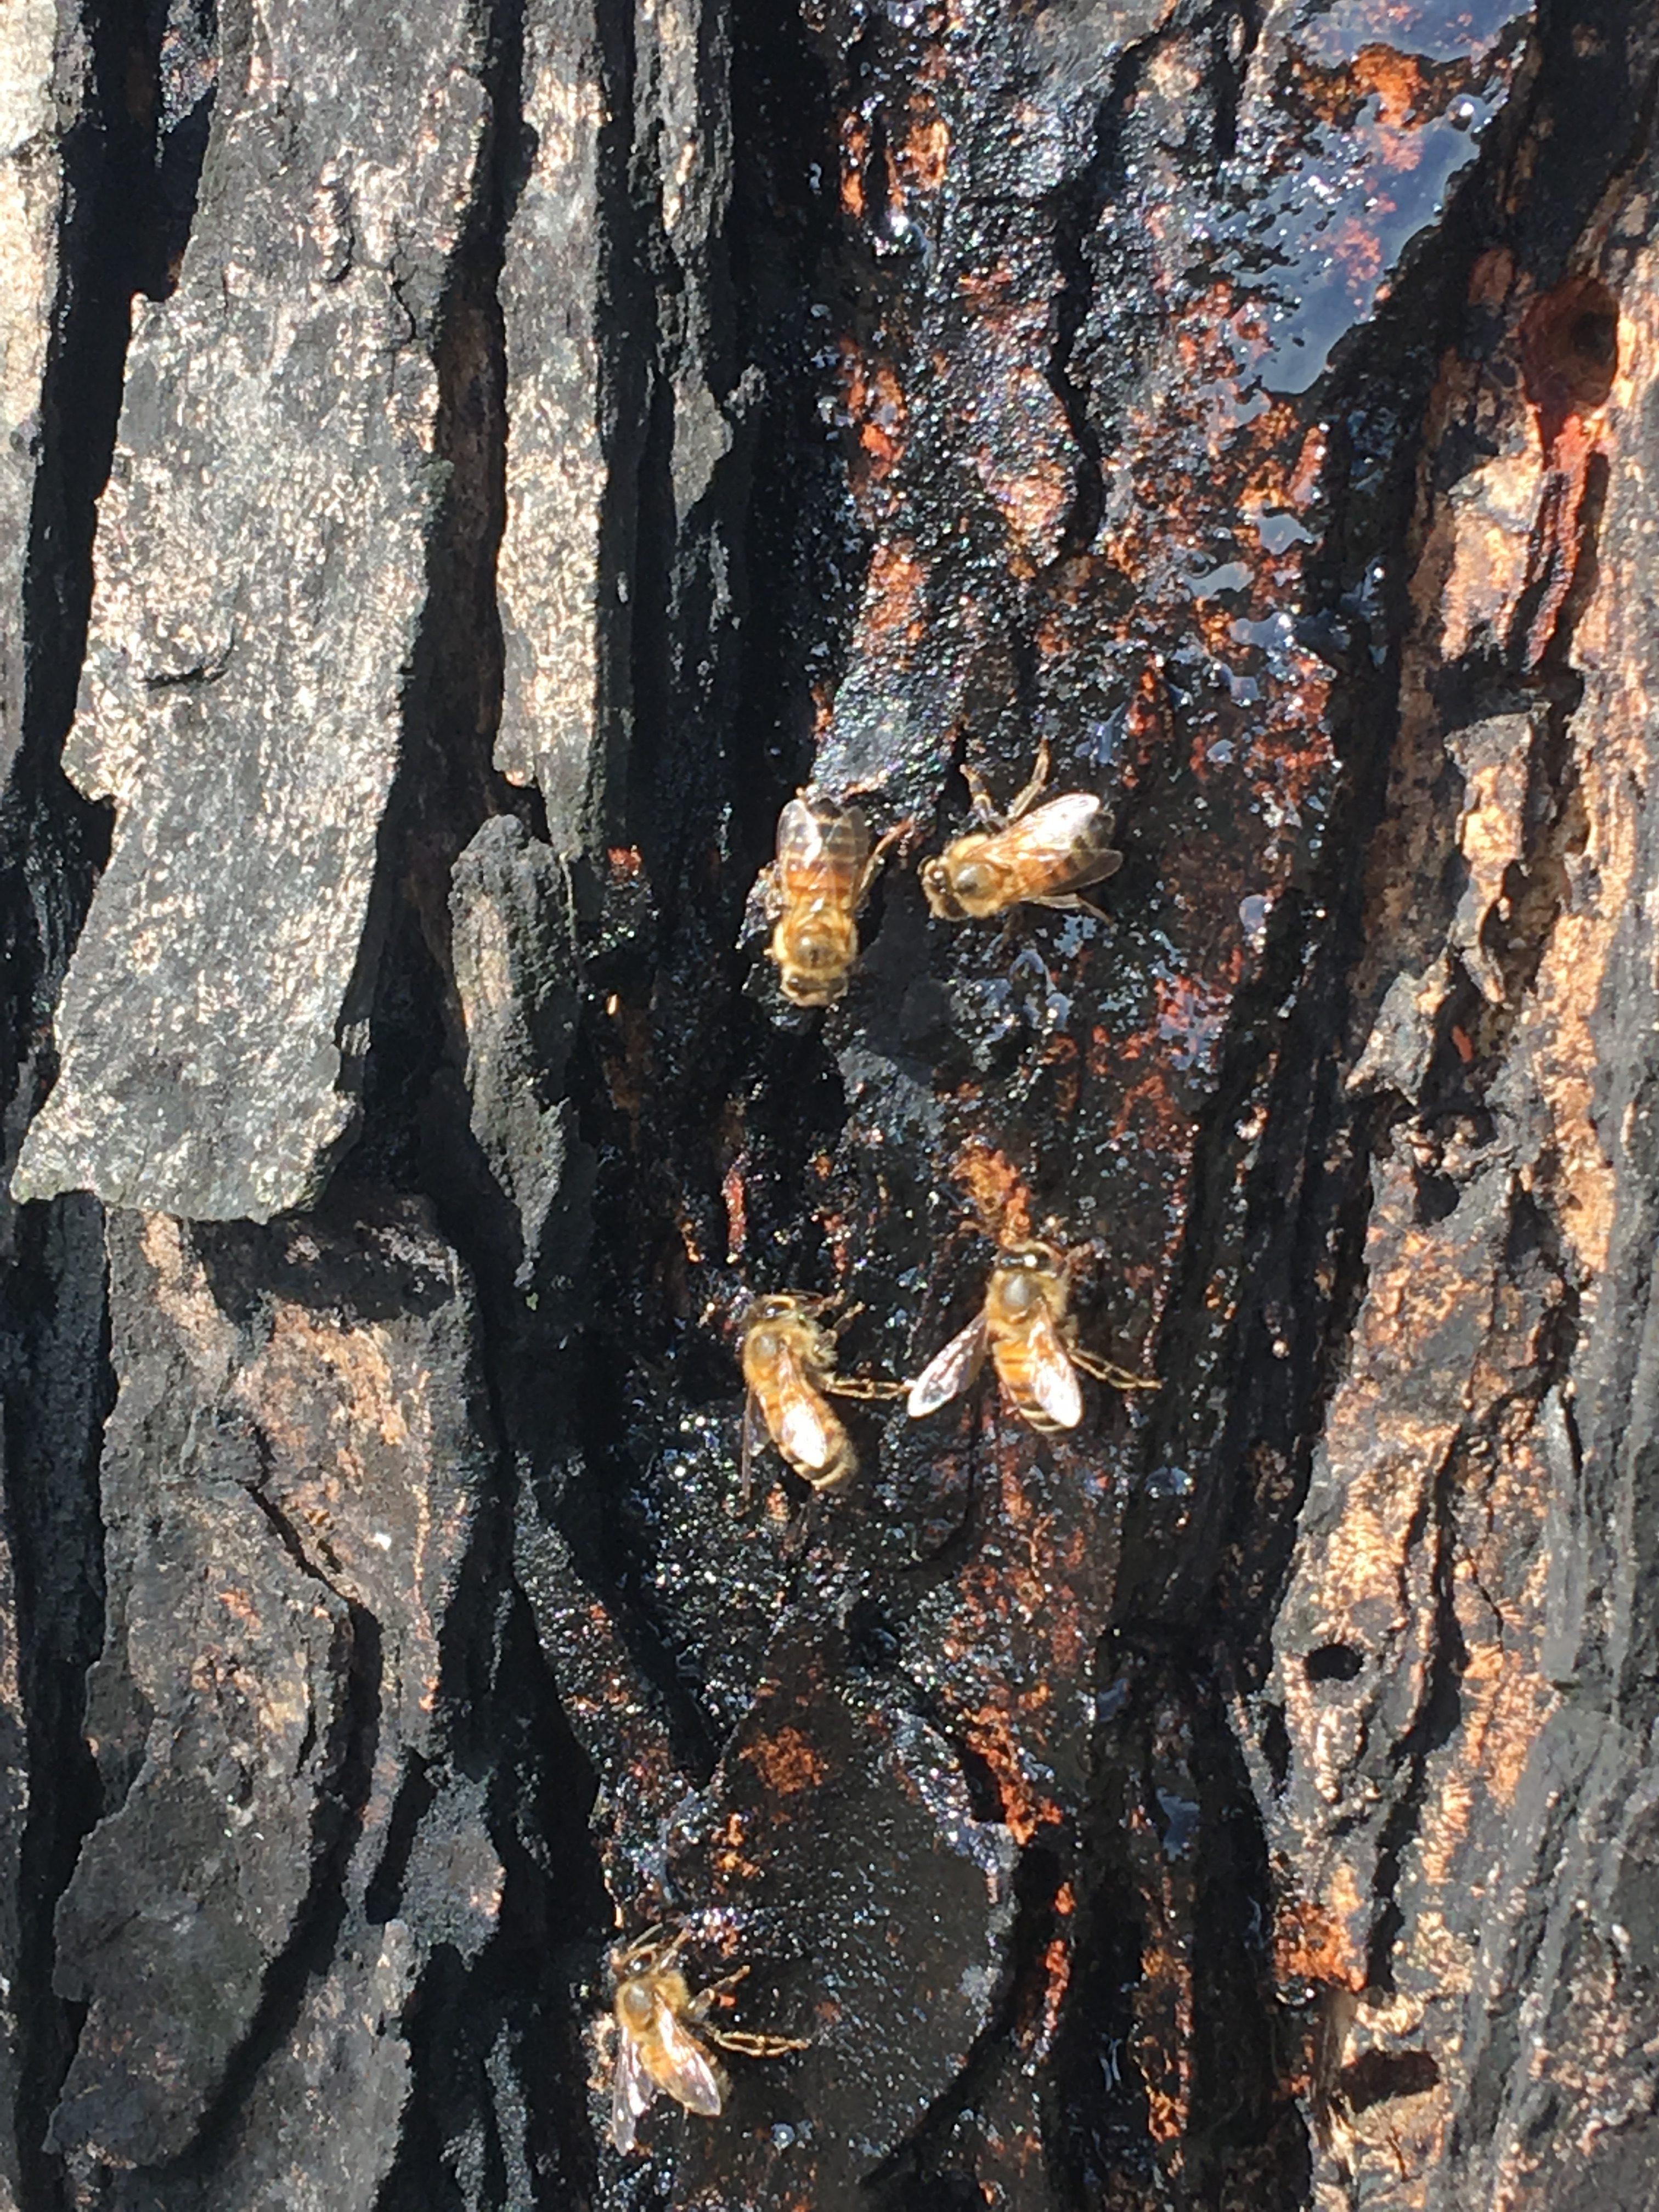 The Honeybee and the Maple Tree